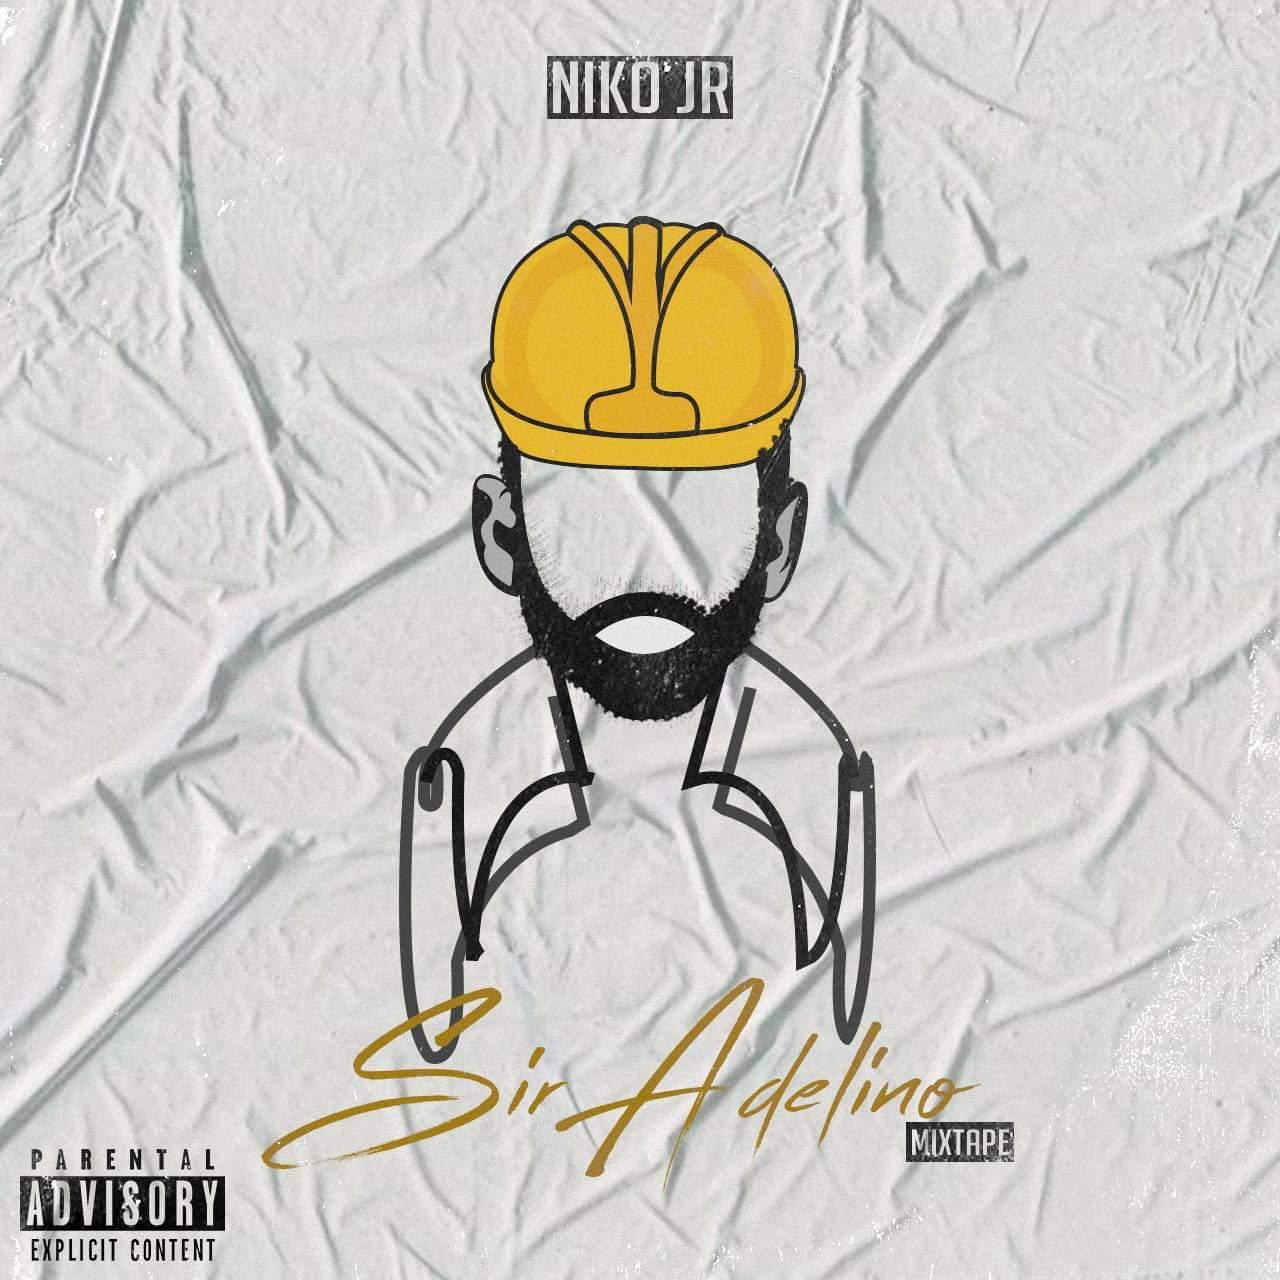 Niko Jr - Sir Adelino Mixtape